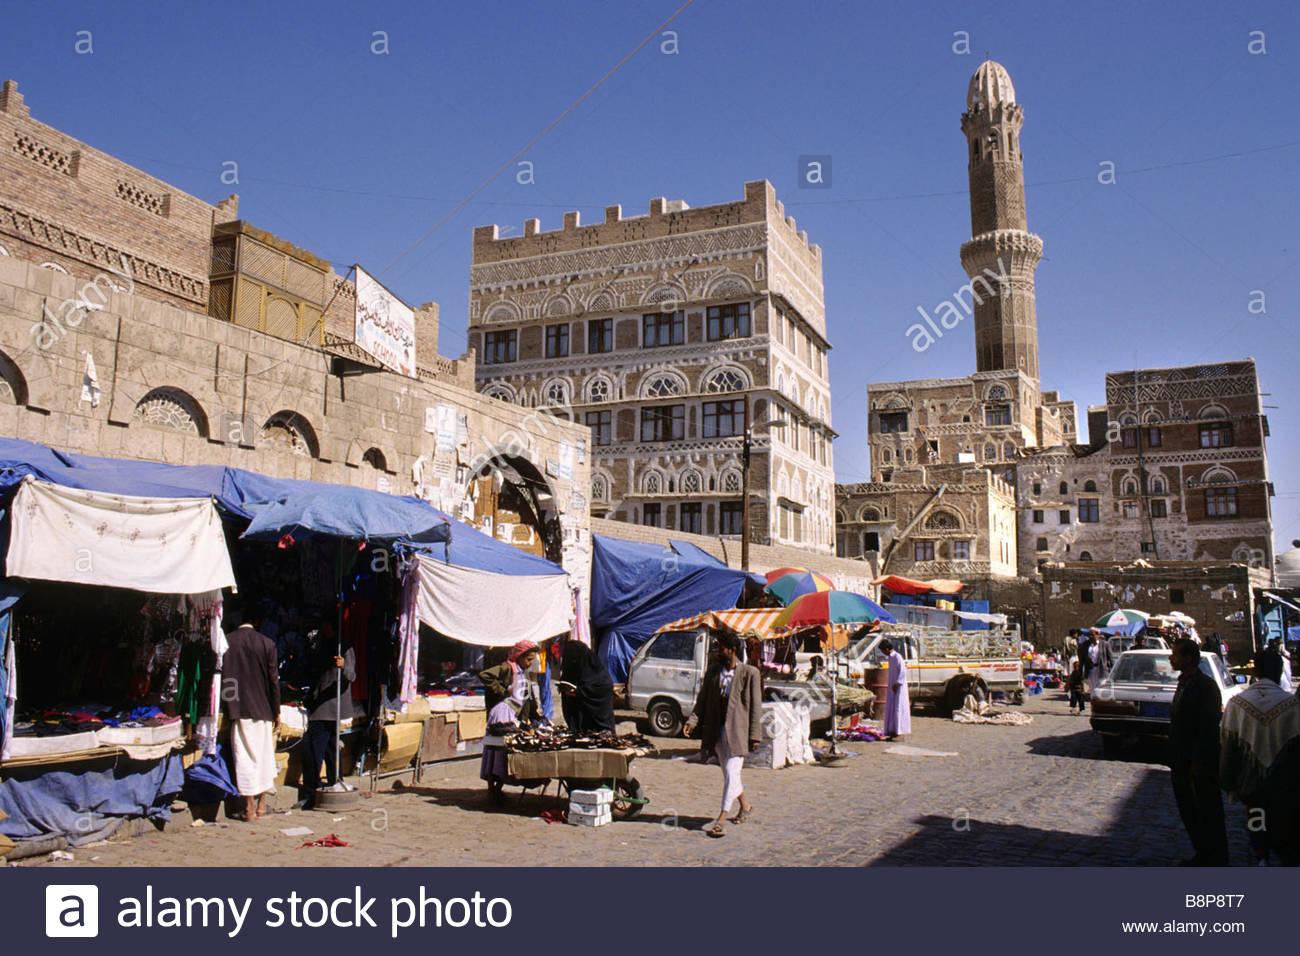 yemen, arabian peninsula - Stock Image